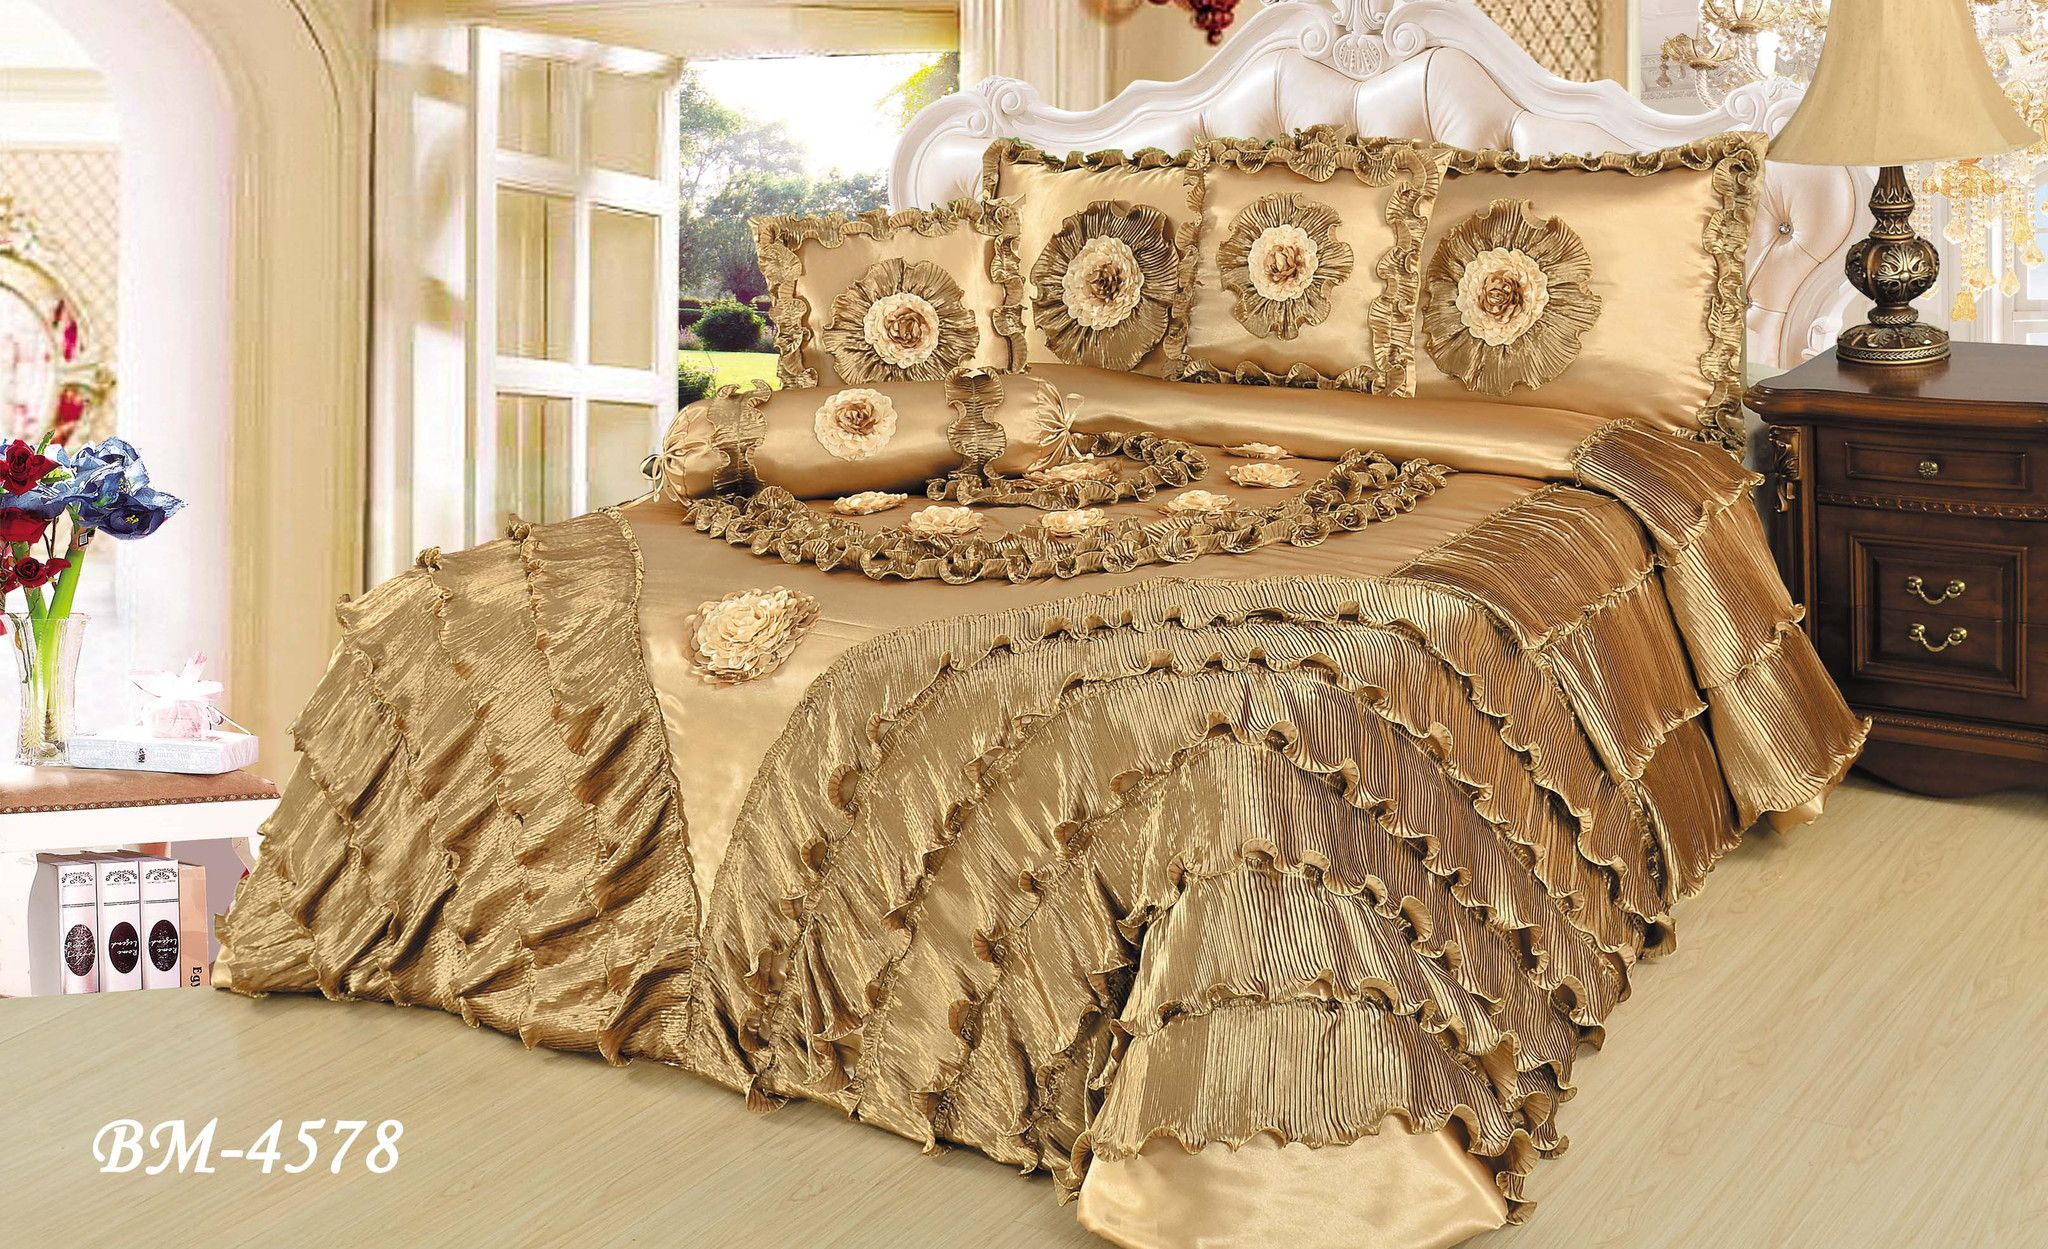 Tache Satin Ruffle Floral Gold Caramel Latte Comforter Bm4578